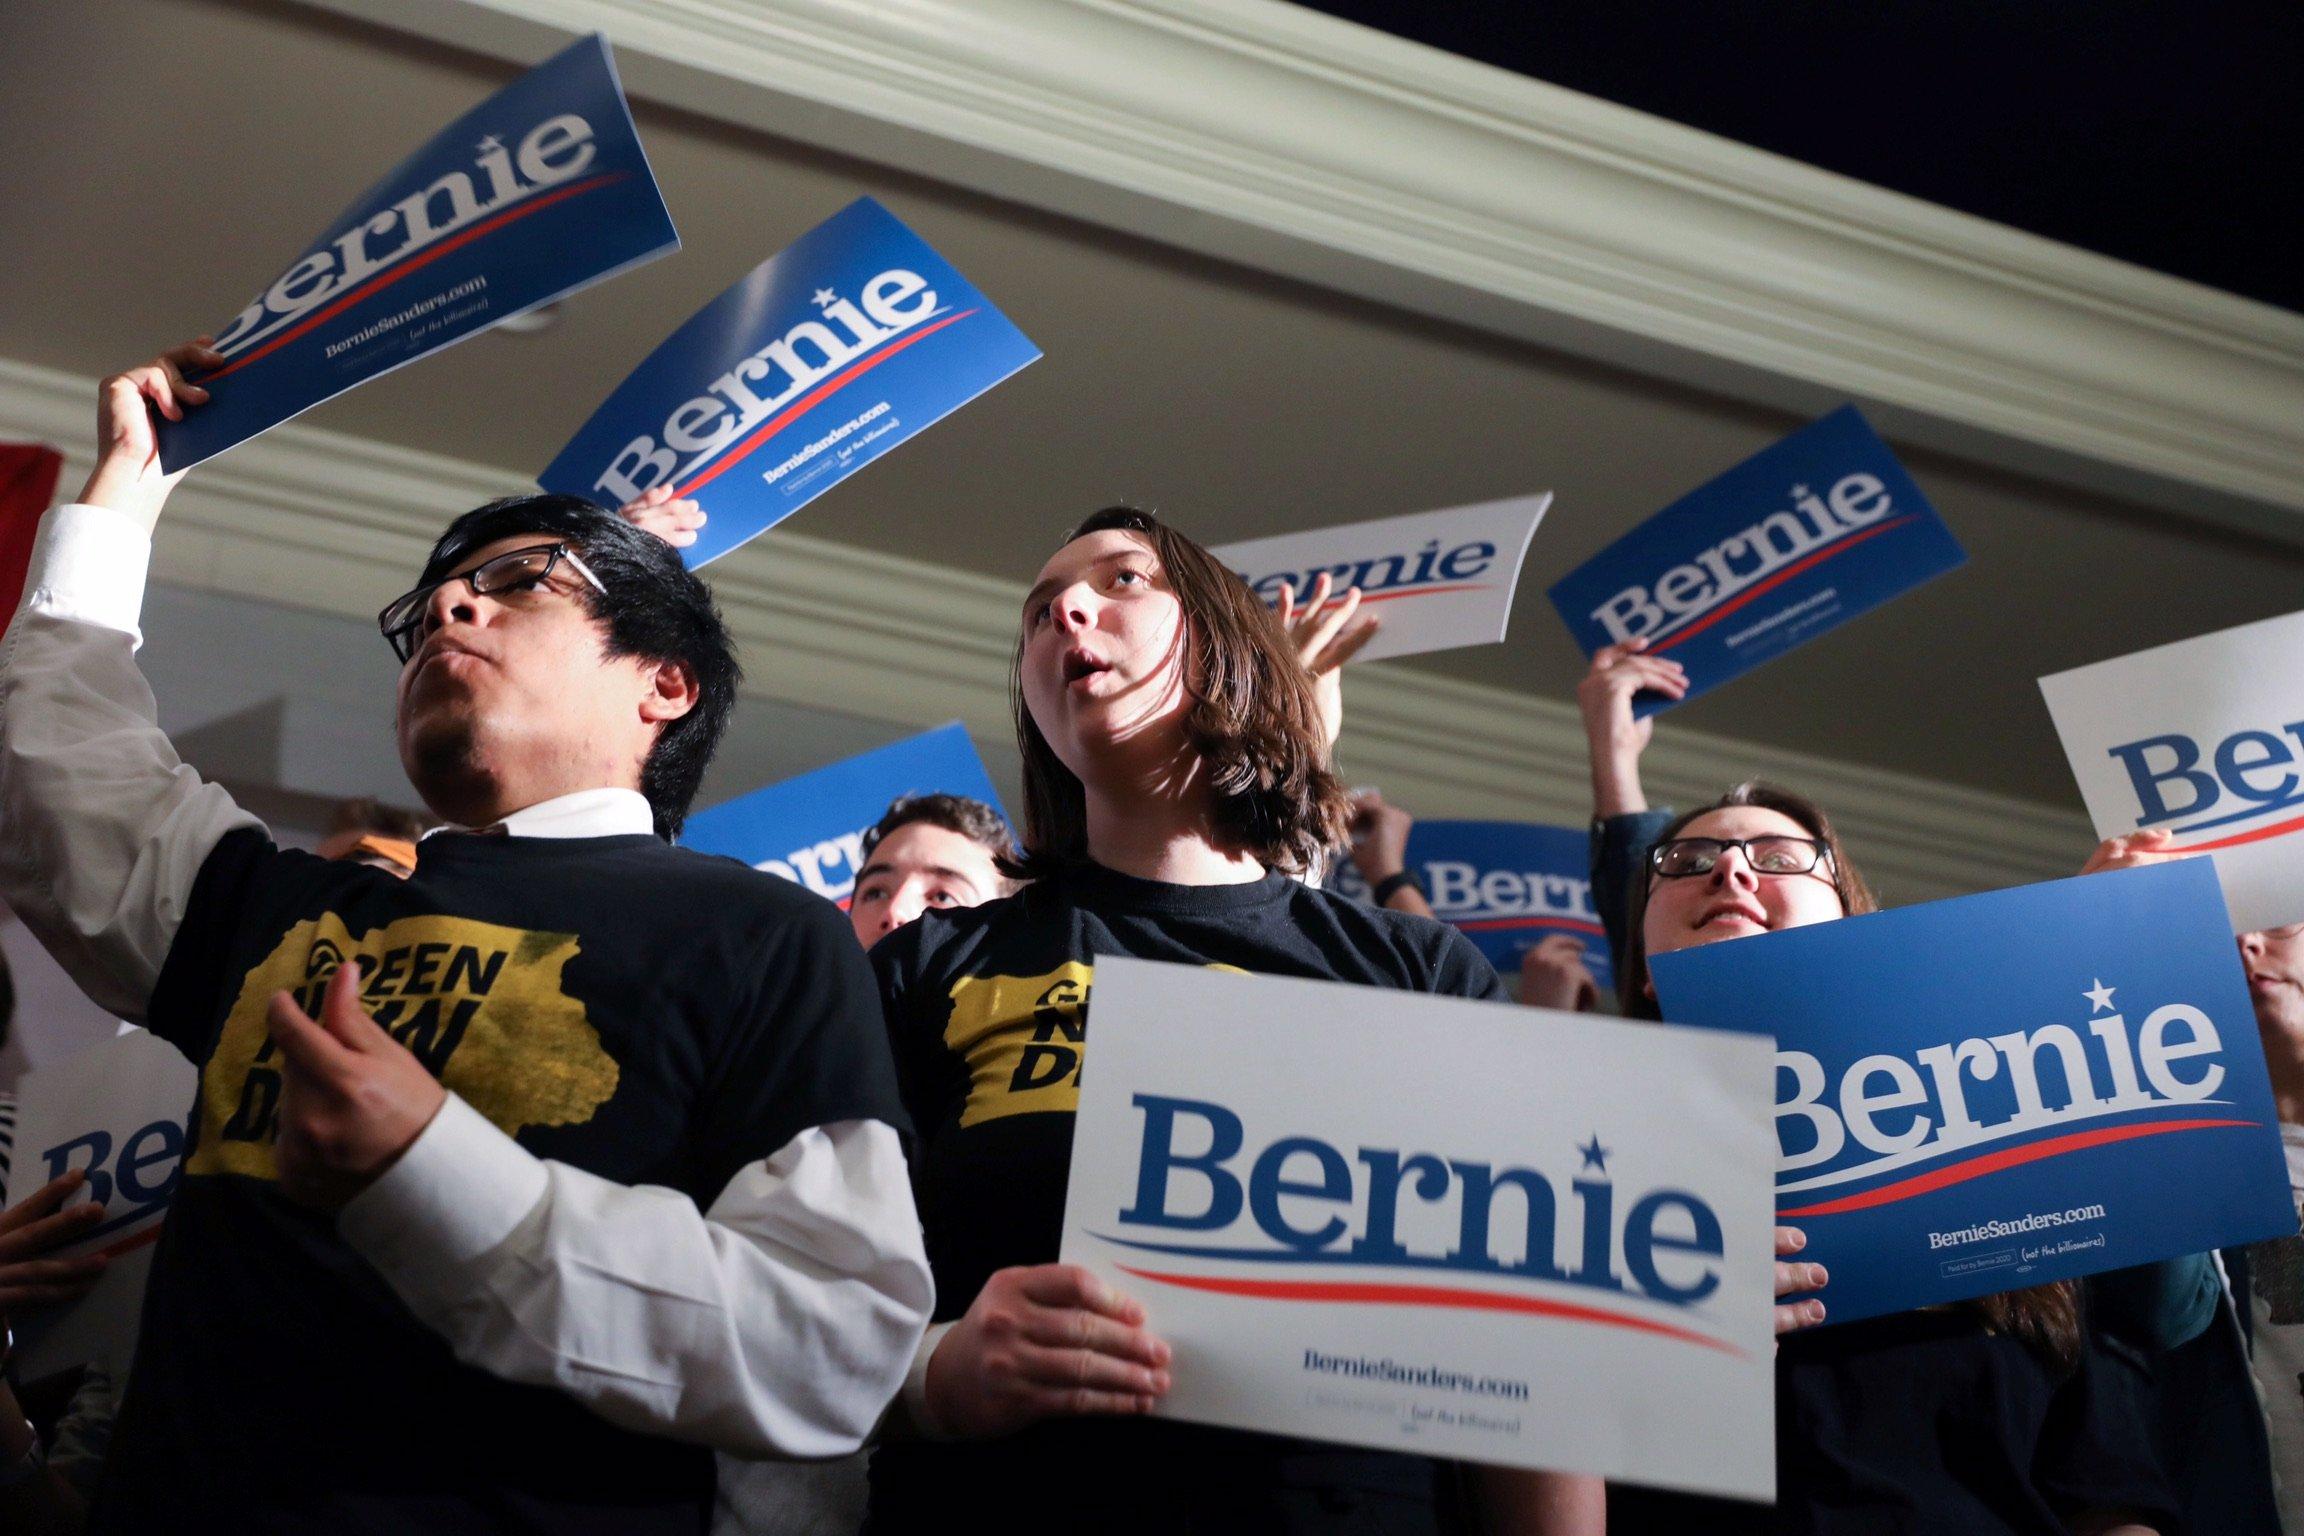 Supporters cheer as Democratic U.S. presidential candidate Senator Bernie Sanders hosts a climate rally with Rep. Rashida Tlaib and Rep. Ro Khanna in Iowa City, Iowa, U.S. Jan. 12, 2020. REUTERS/Scott Morgan